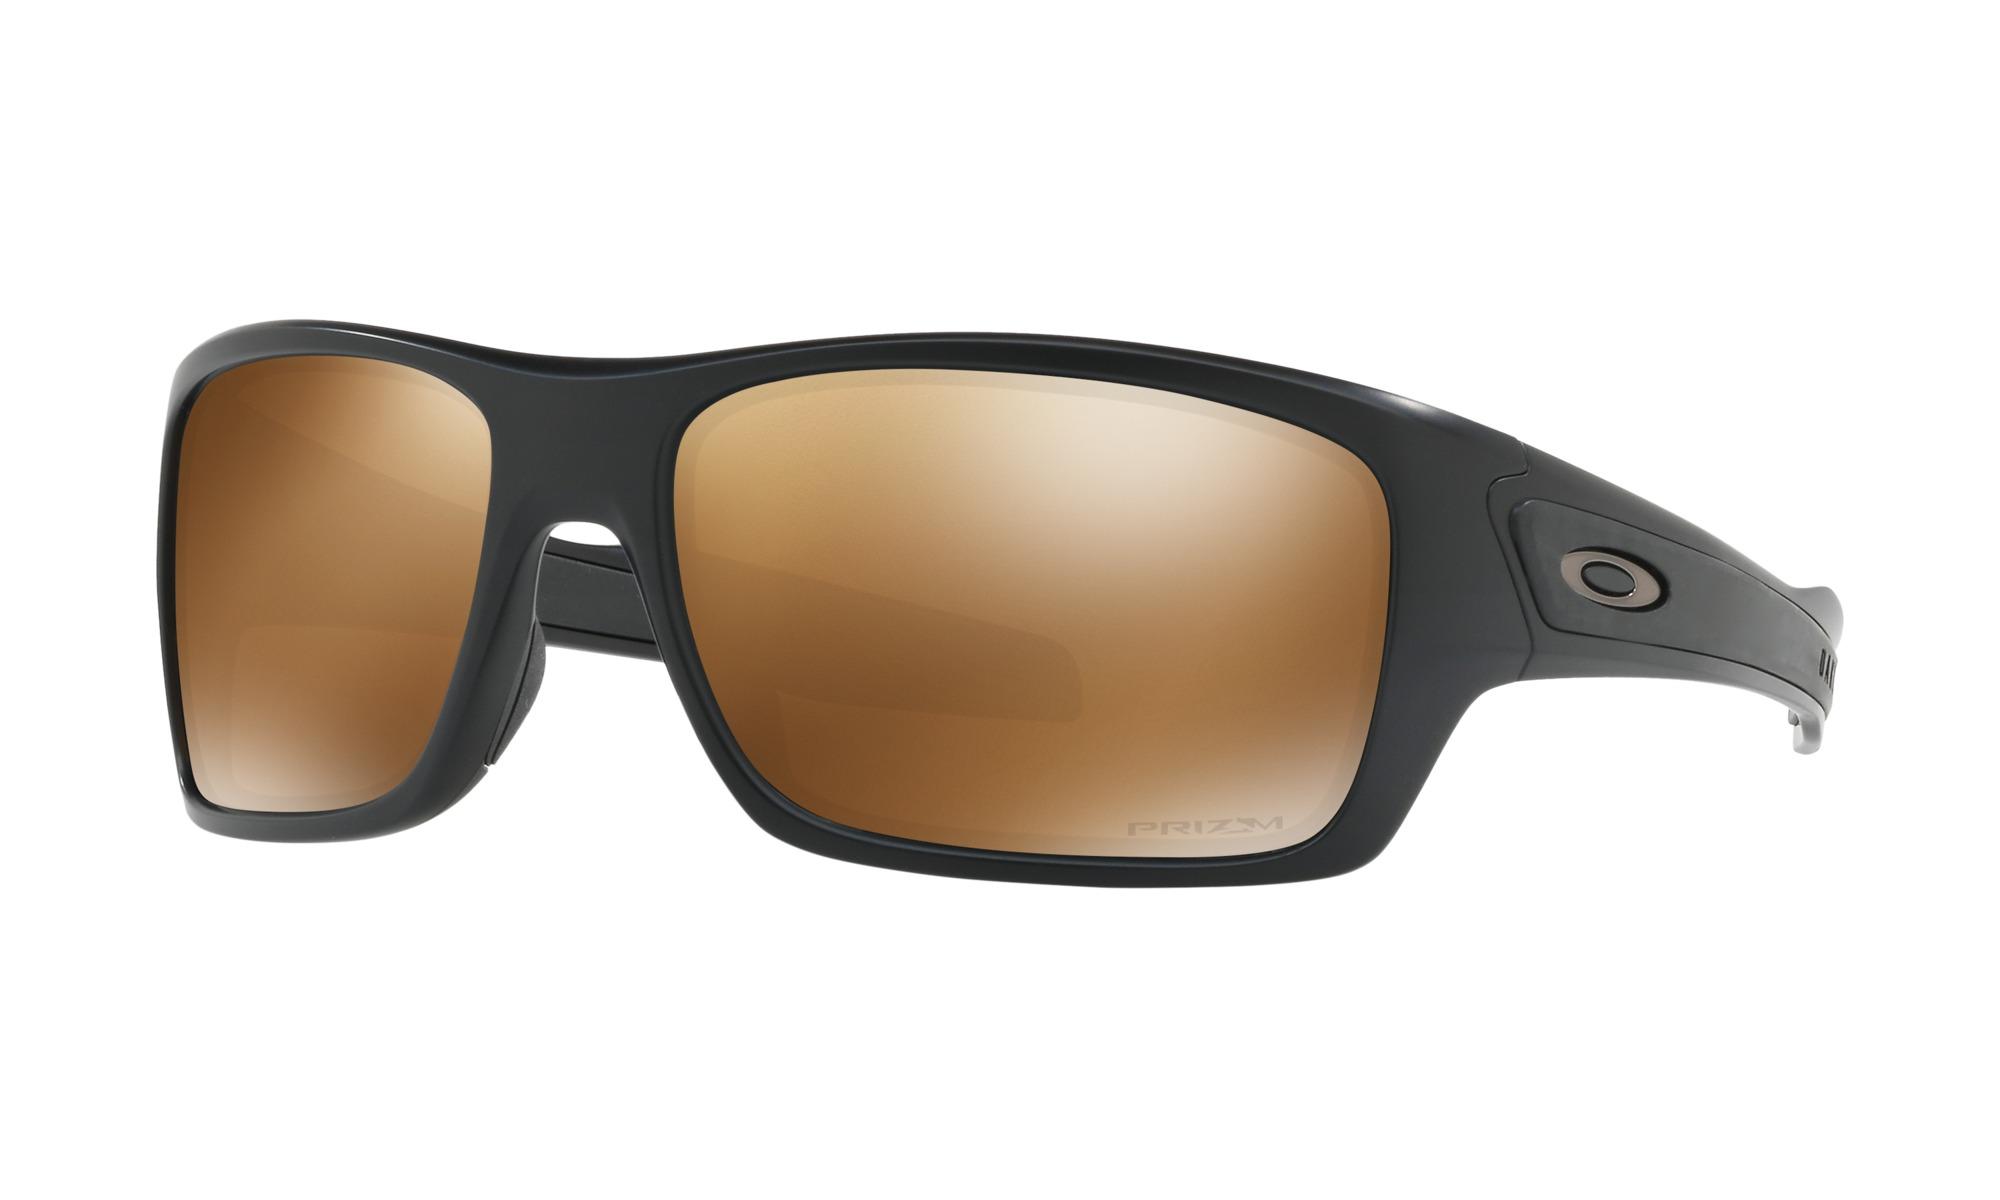 4a0350a819661 Oakley Turbine Prizm Daily Polarized Sunglasses. Full Screen